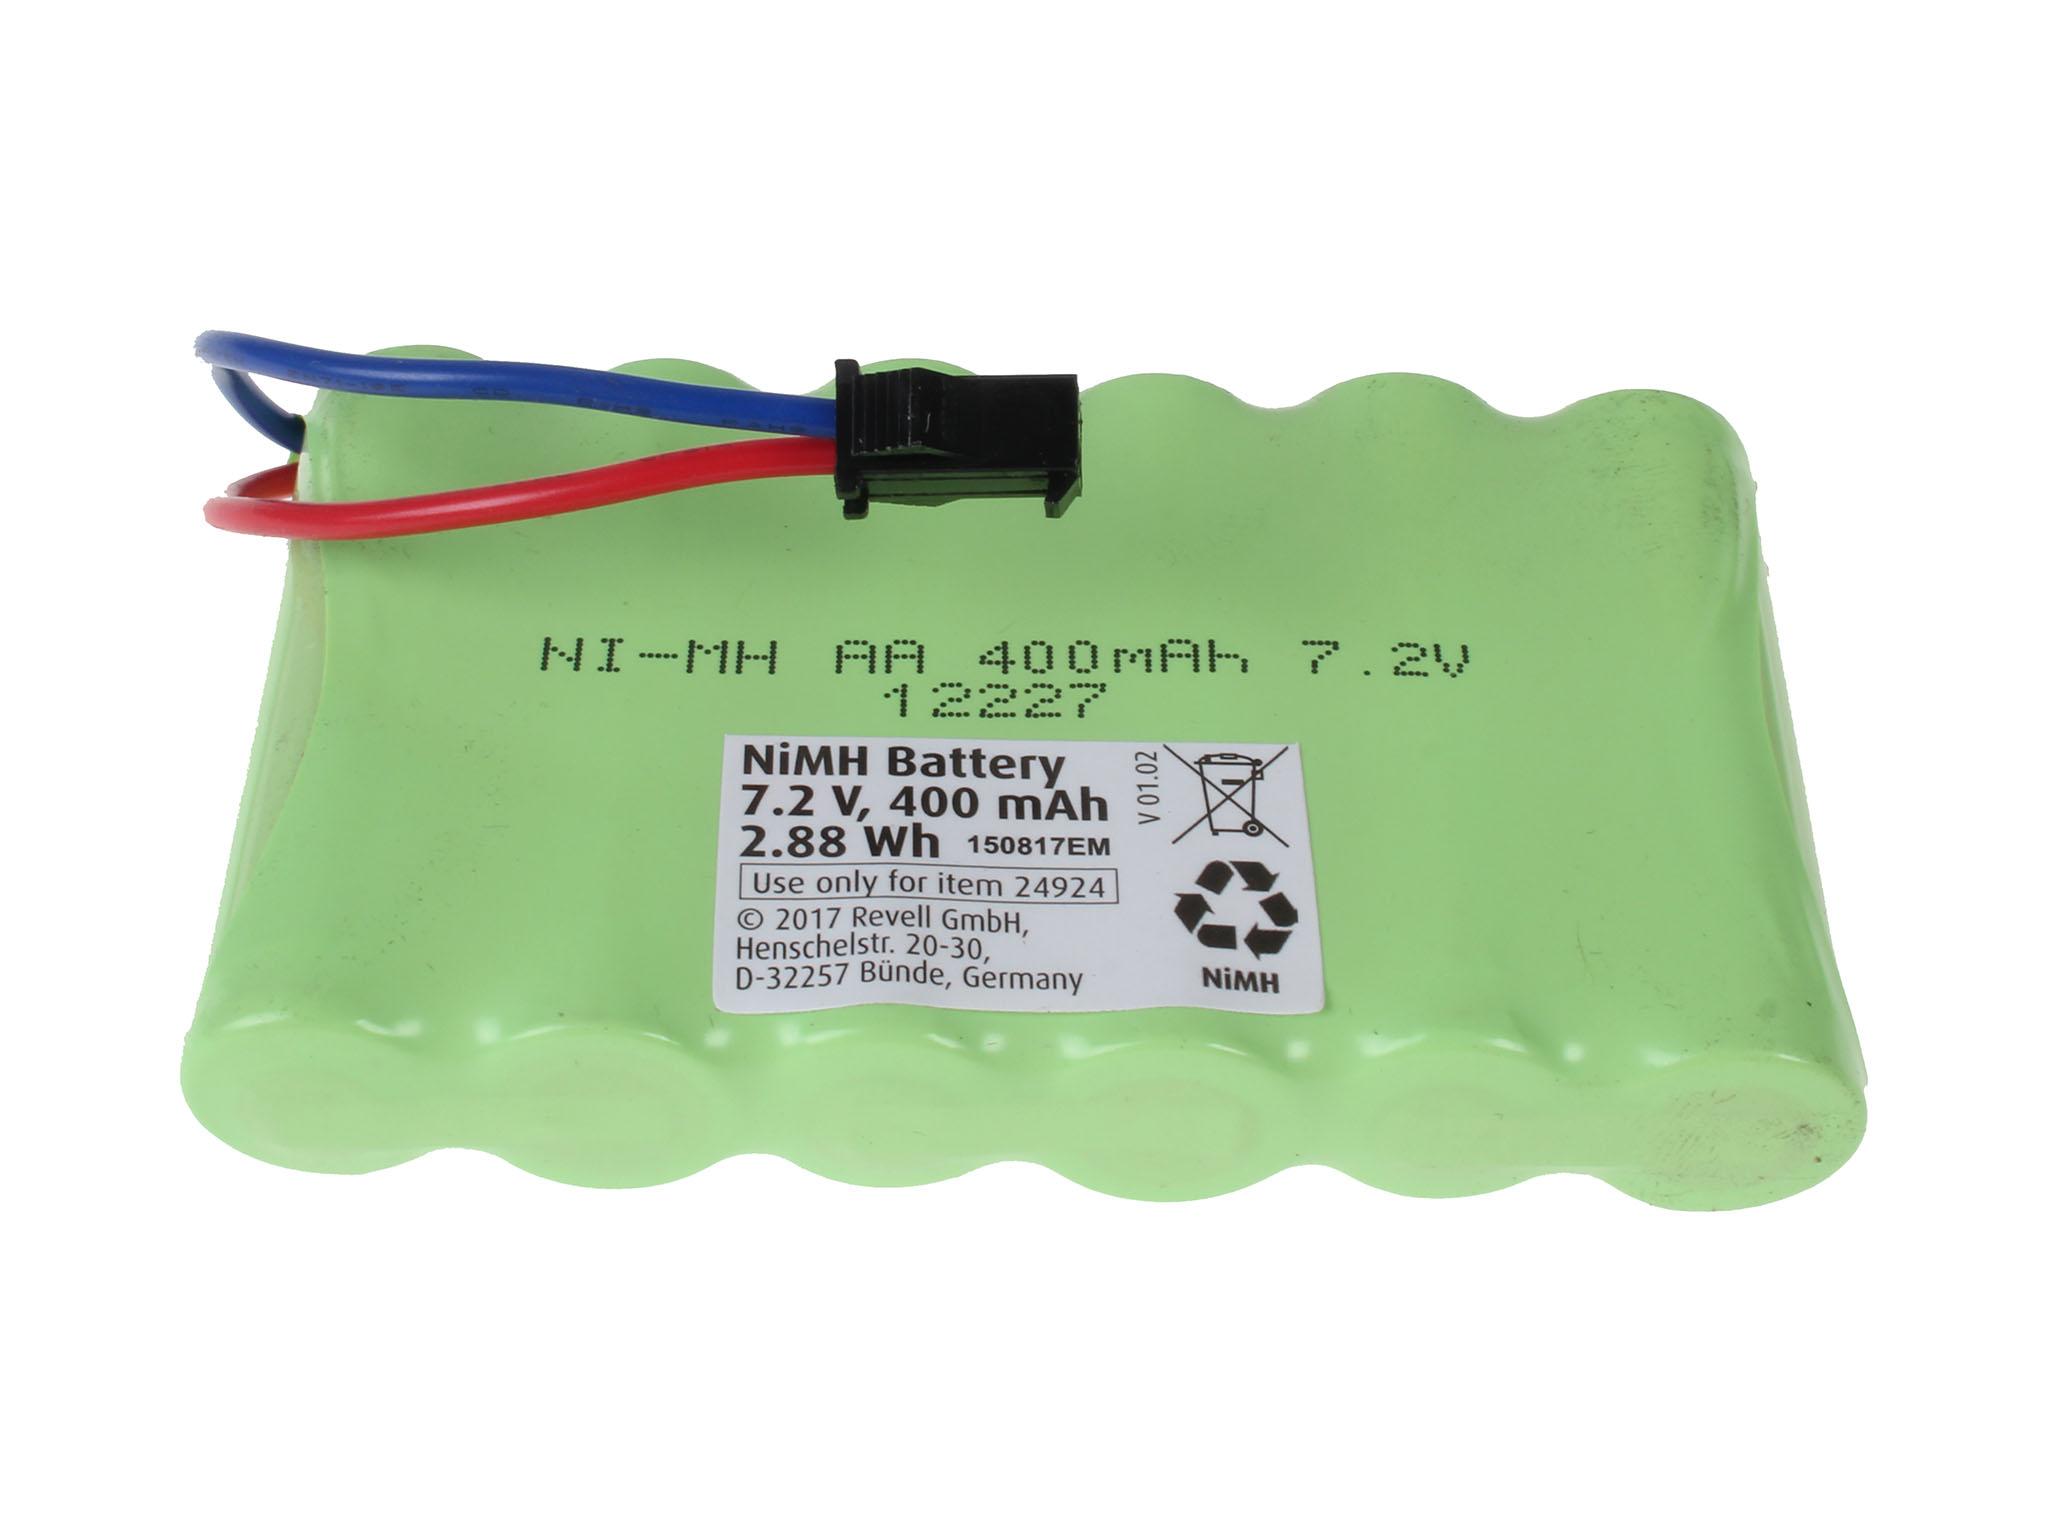 2 Stück 2400mAh AA Ni-MH Akkus 7,2 V SM-2P Stecker mit USB Ladekabel für RC Toys